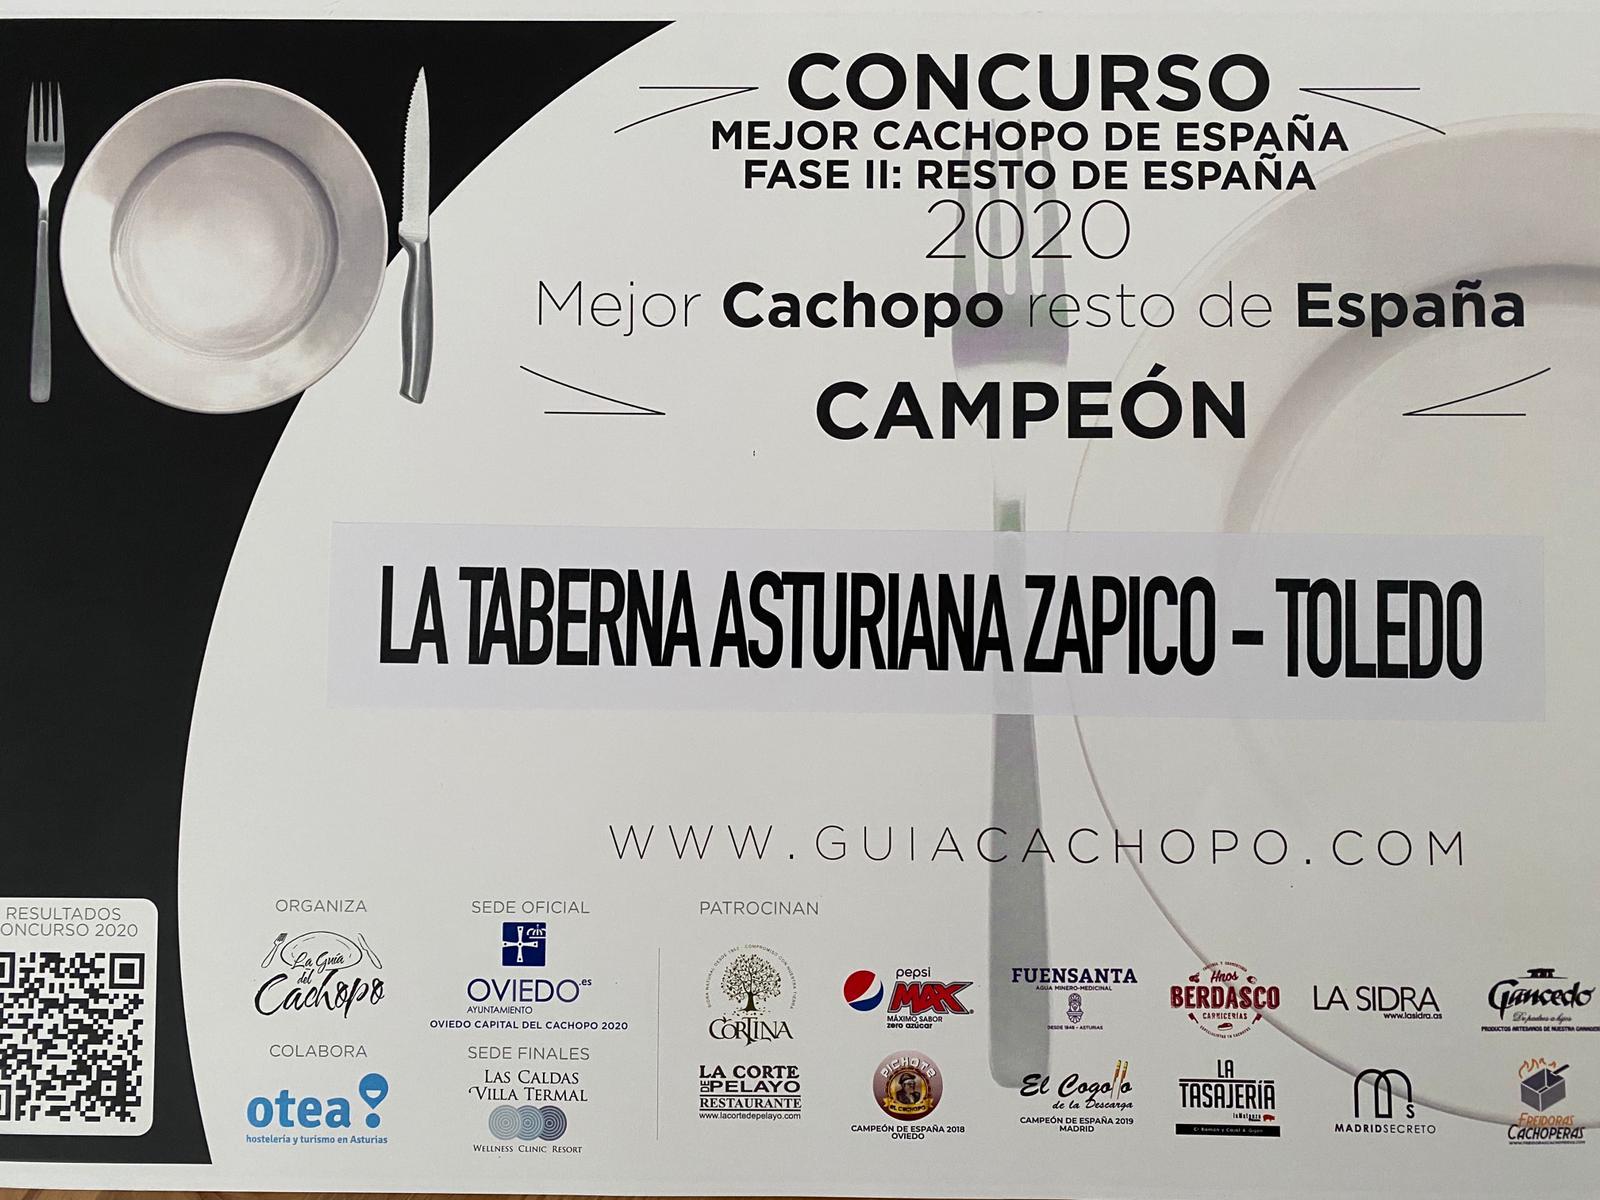 Campeón Mejor Cachopo de España 2020 - Taberna Asturiana Zapico